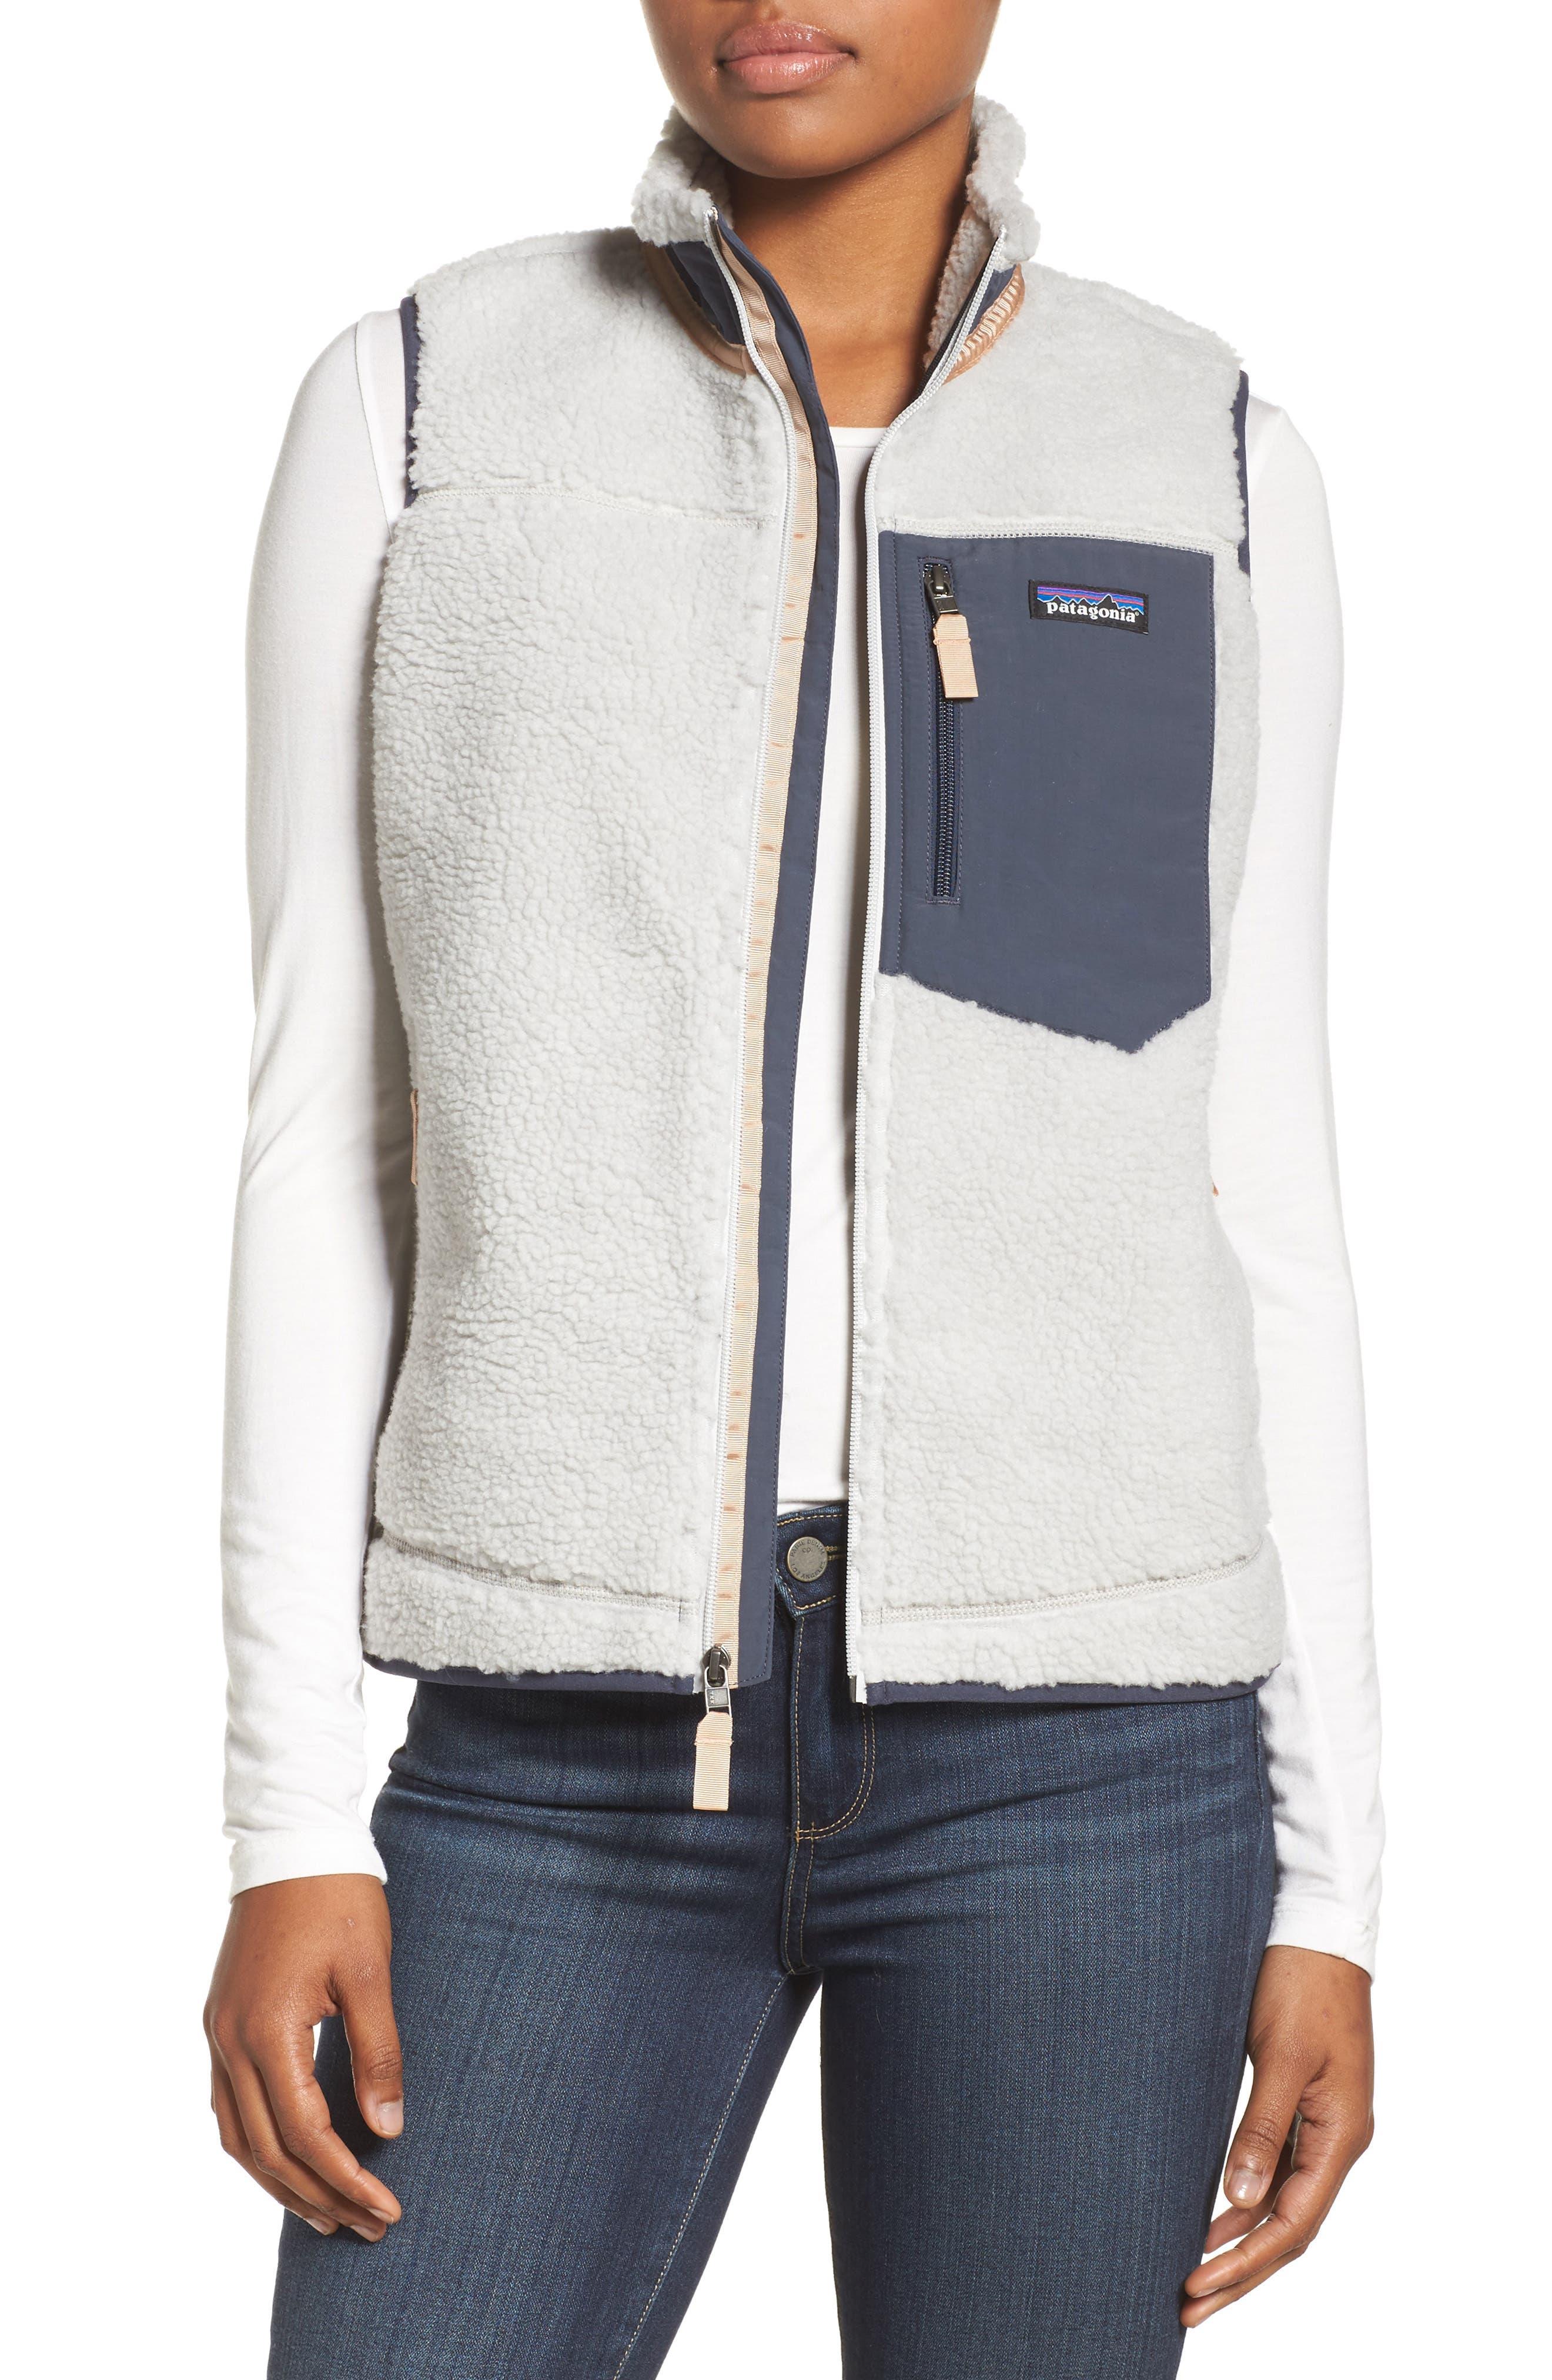 Classic Retro-X<sup>®</sup> Fleece Vest,                             Main thumbnail 1, color,                             Tailored Grey W/ Smolder Blue